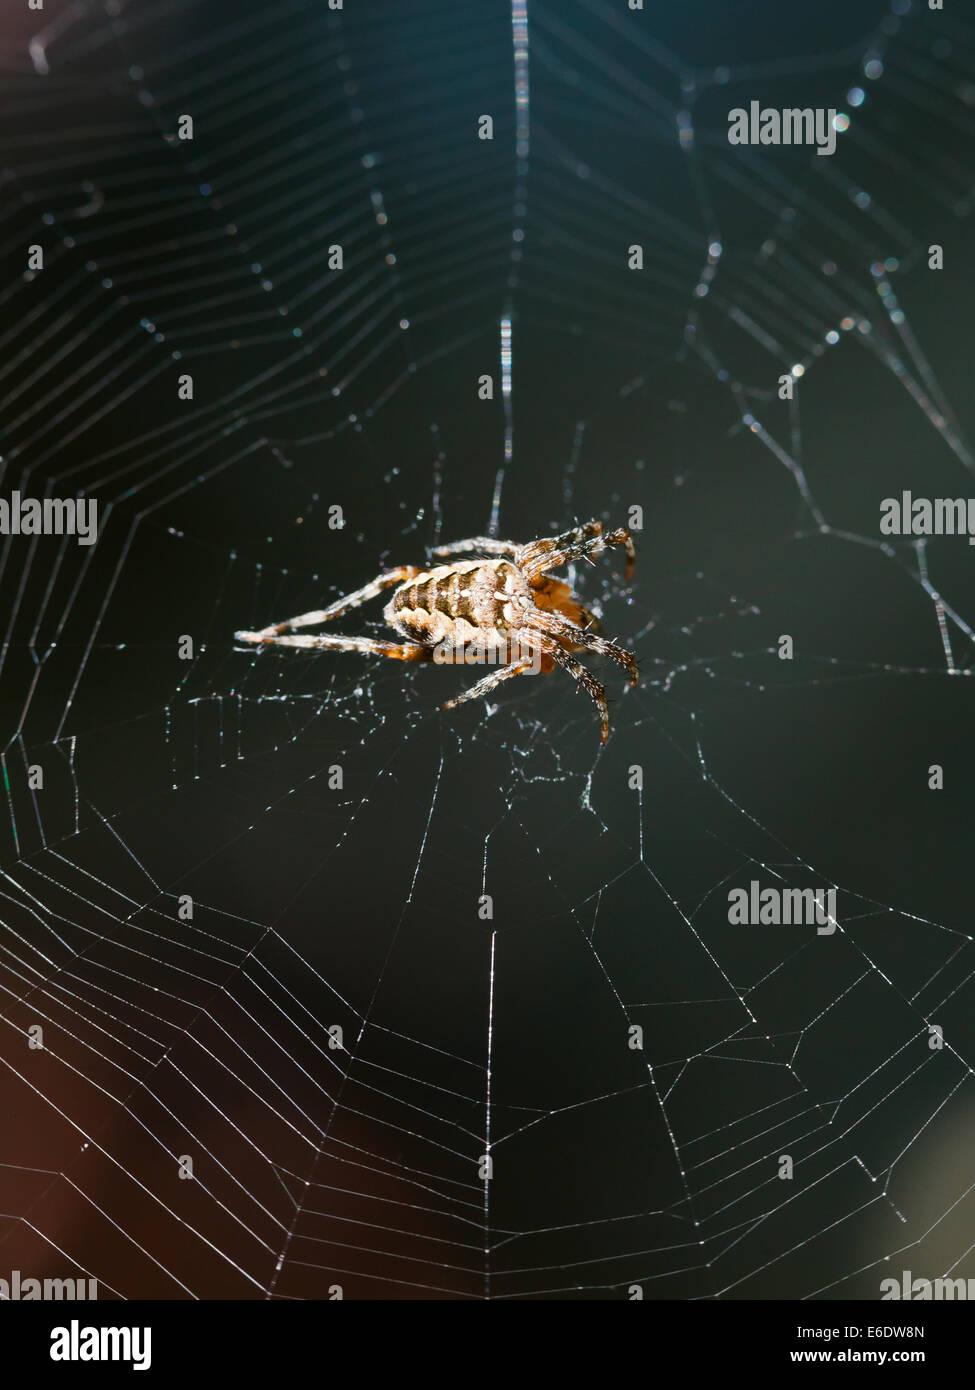 European garden spider on spiderweb close up outdoors - Stock Image